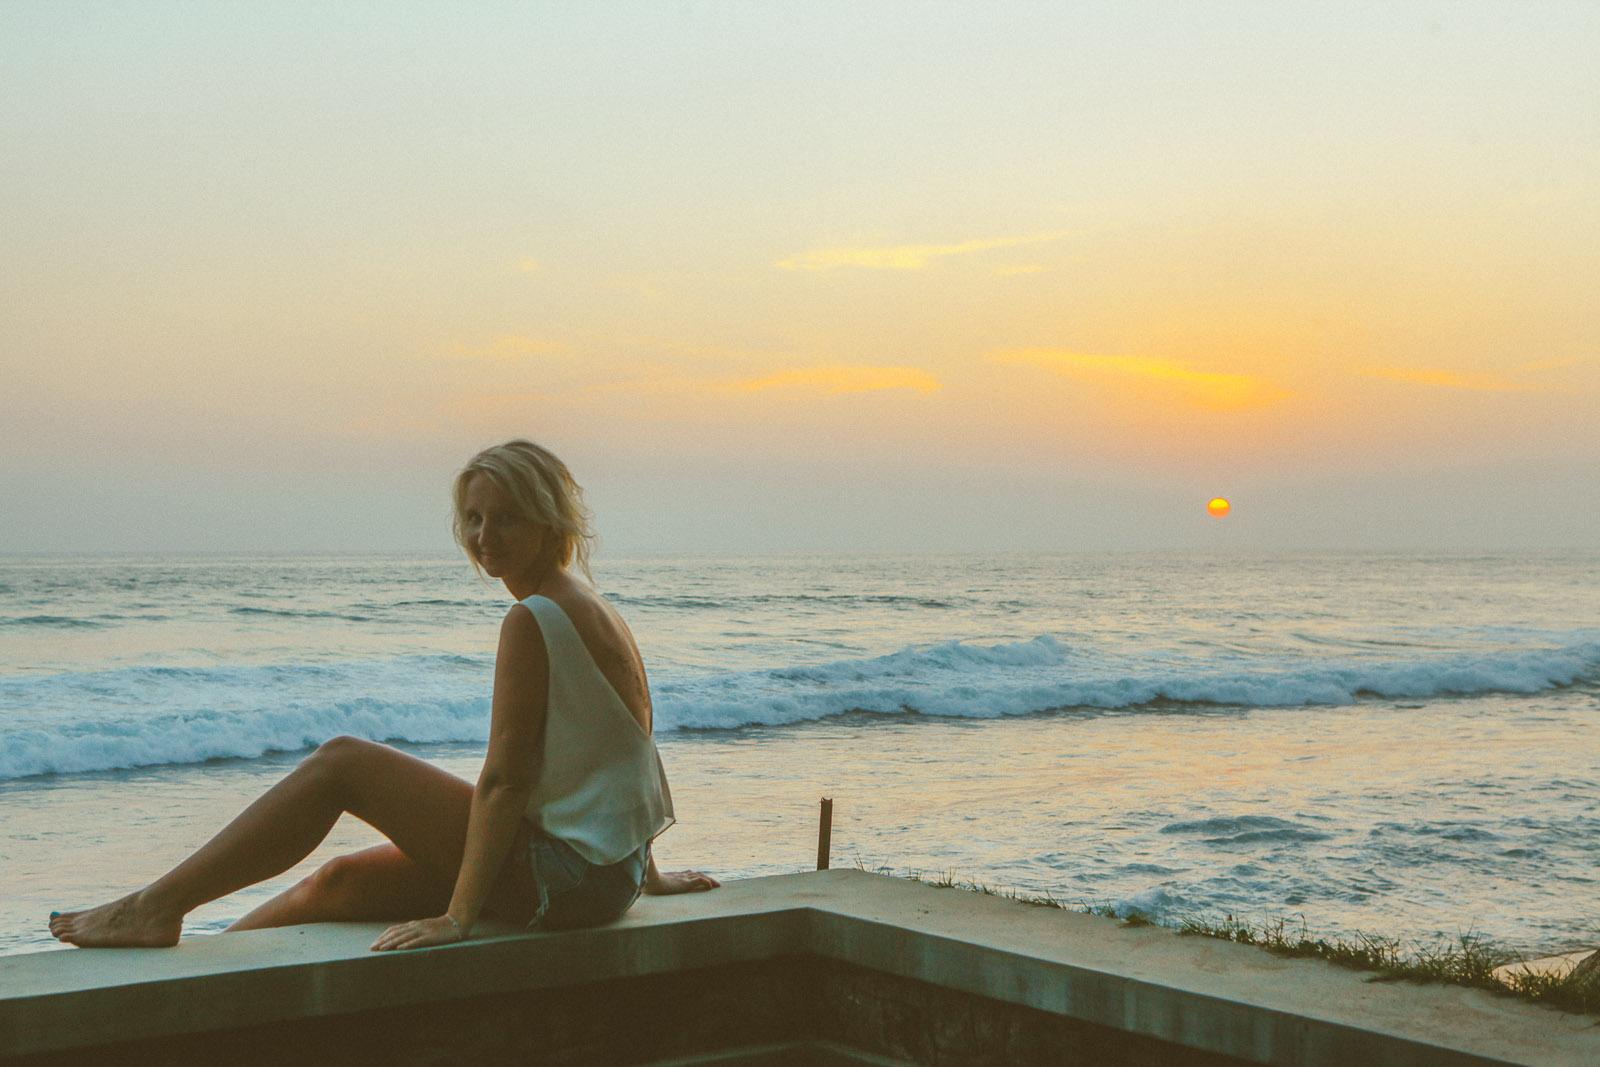 Sri Lanka-Hikkaduwa-Midigama-thalpe-era-beach-jetwing-surf-travel-blog-IMG_8738